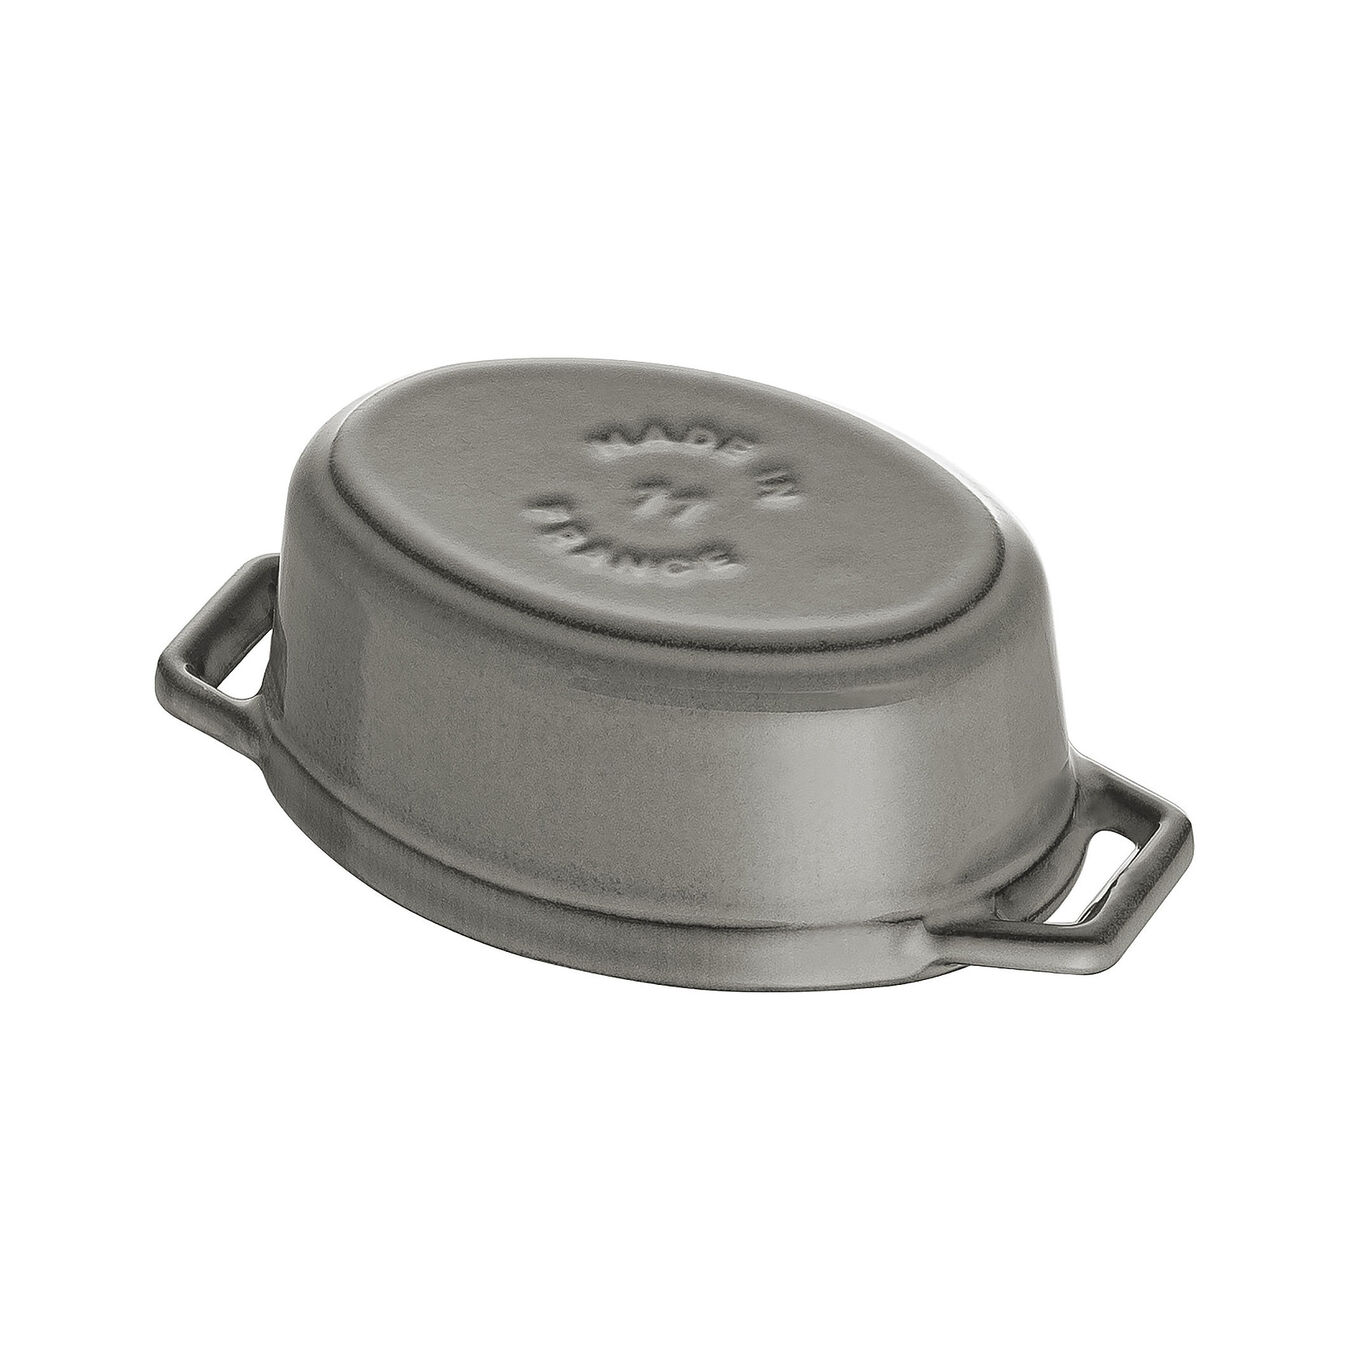 Mini cocotte ovale - 11 cm, grigio grafite,,large 4